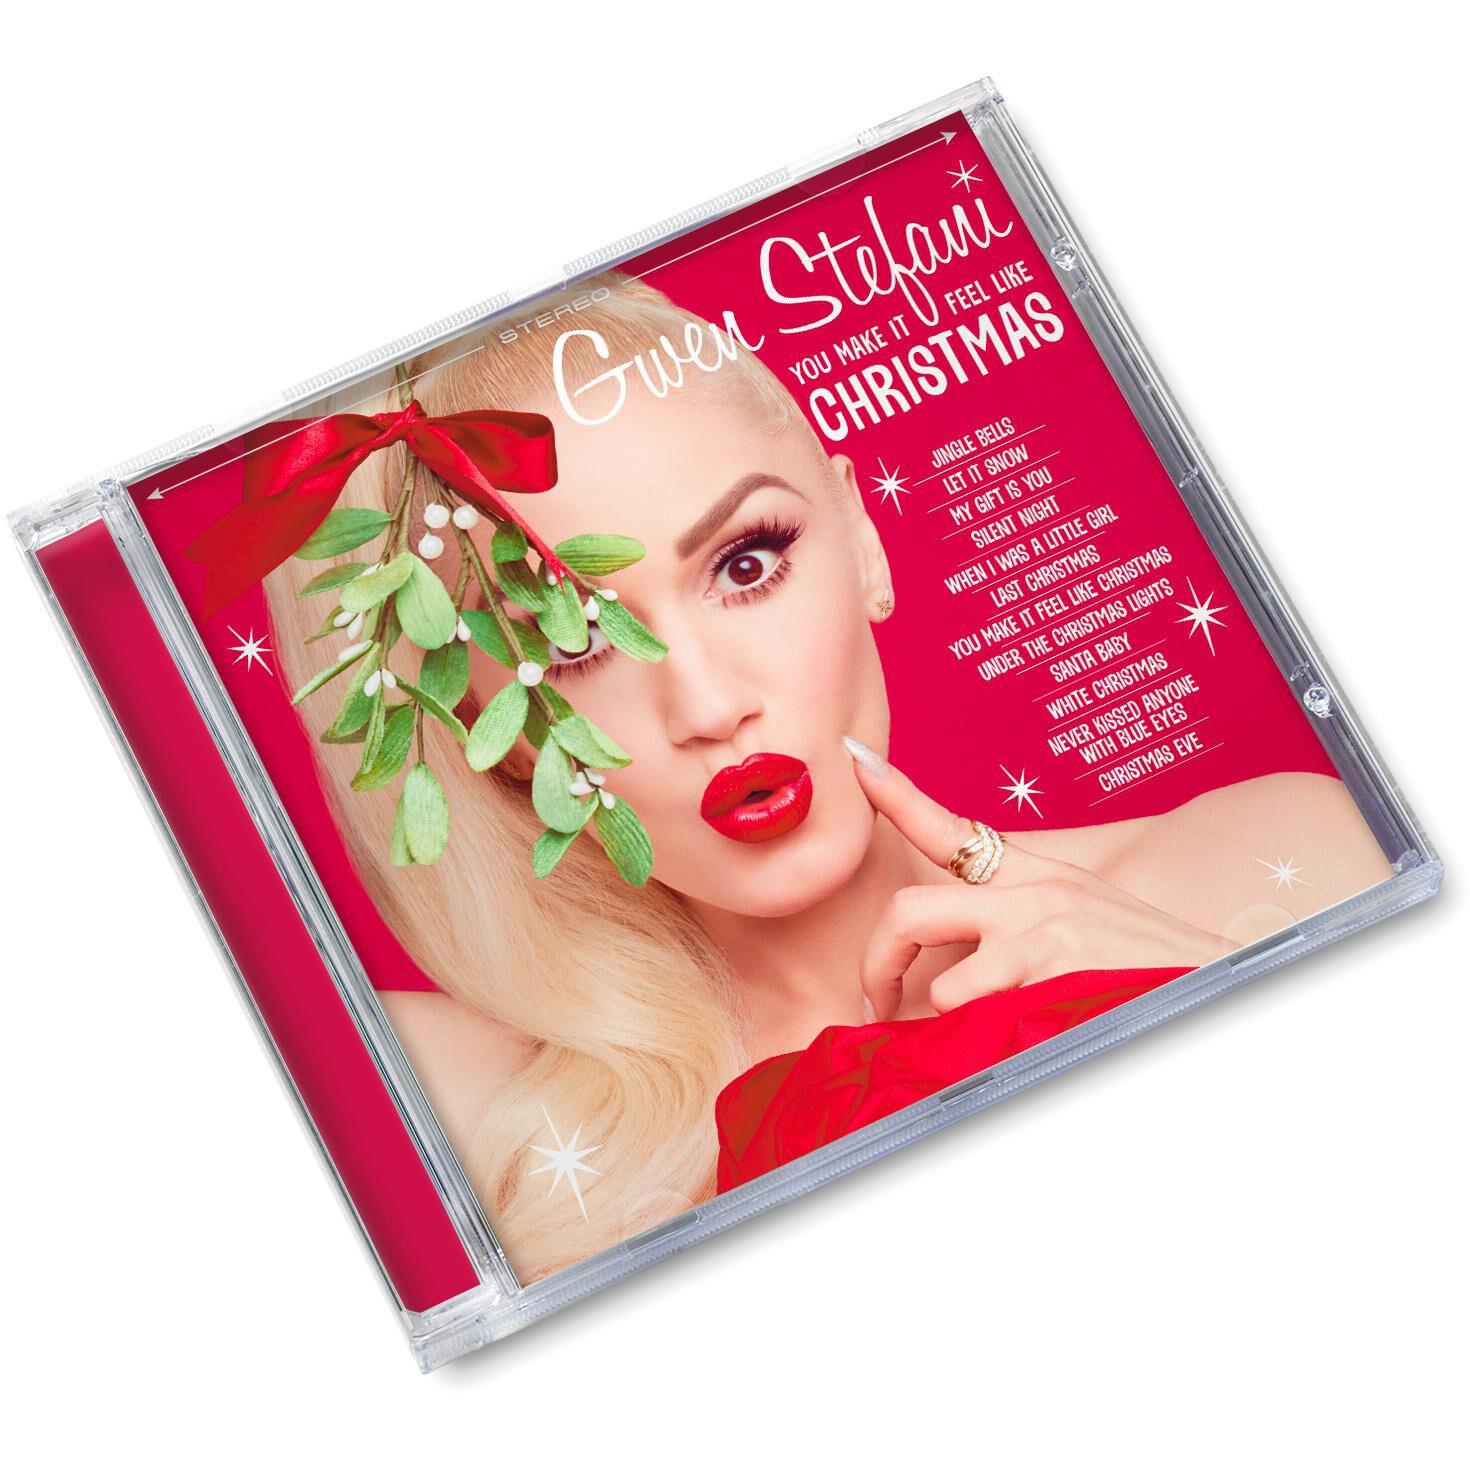 Gwen Stefani Christmas Cd.You Make Me Feel Like Christmas By Gwen Stefani Cd